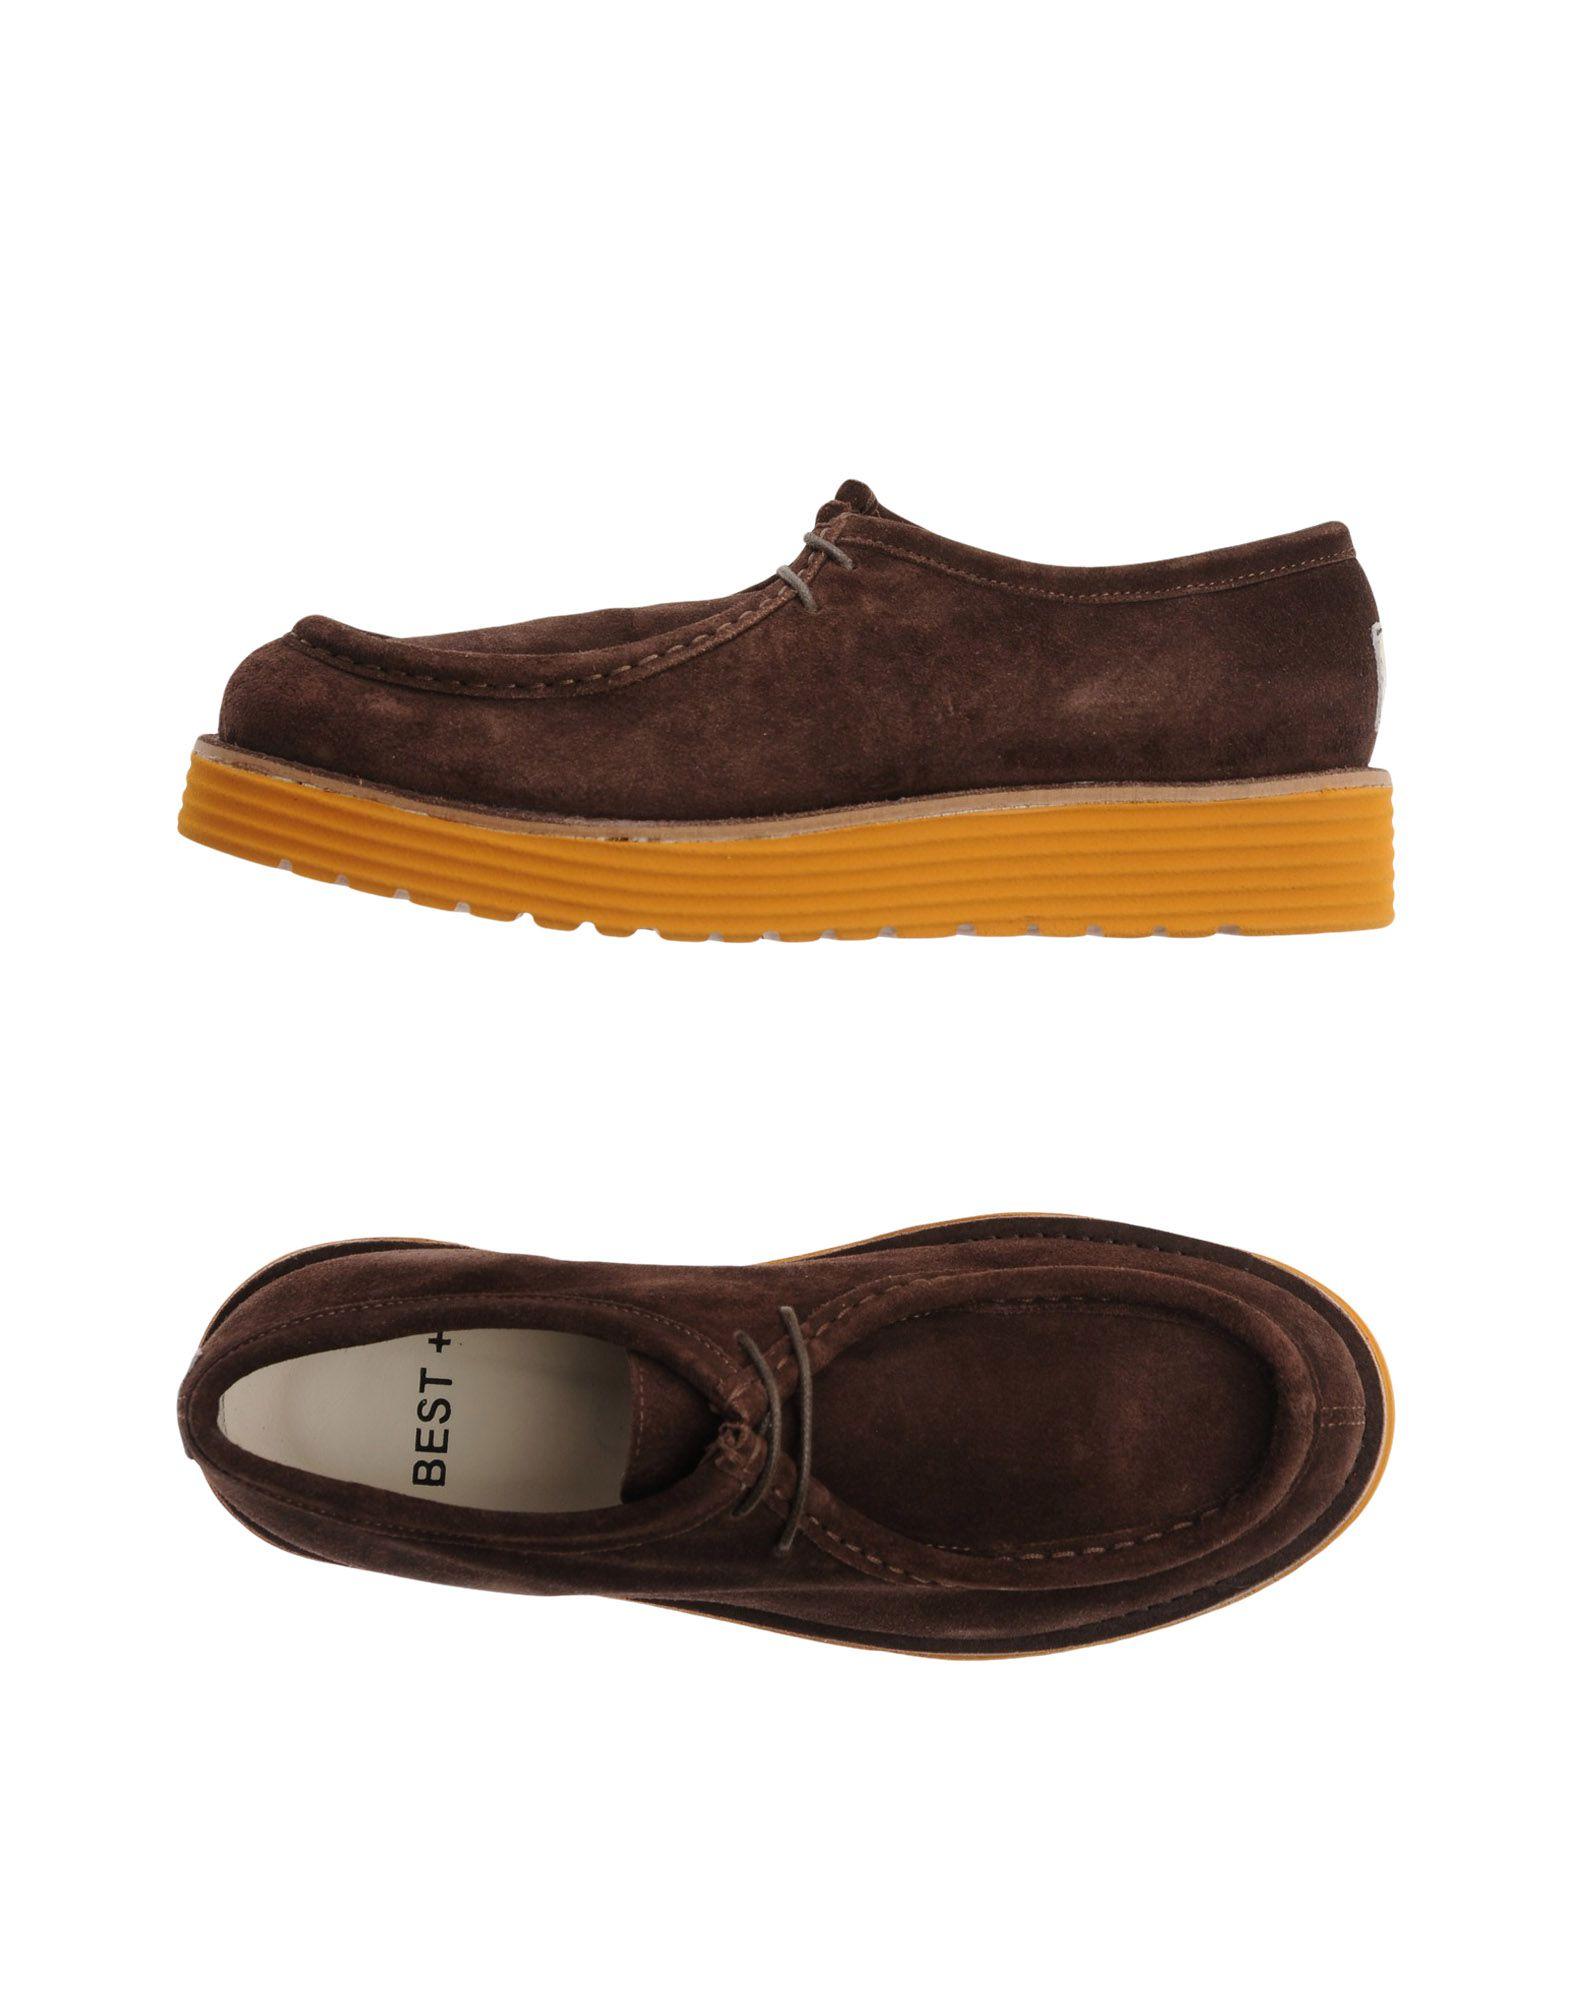 Best + Schnürschuhe Damen  11240497TQ Gute Qualität beliebte Schuhe